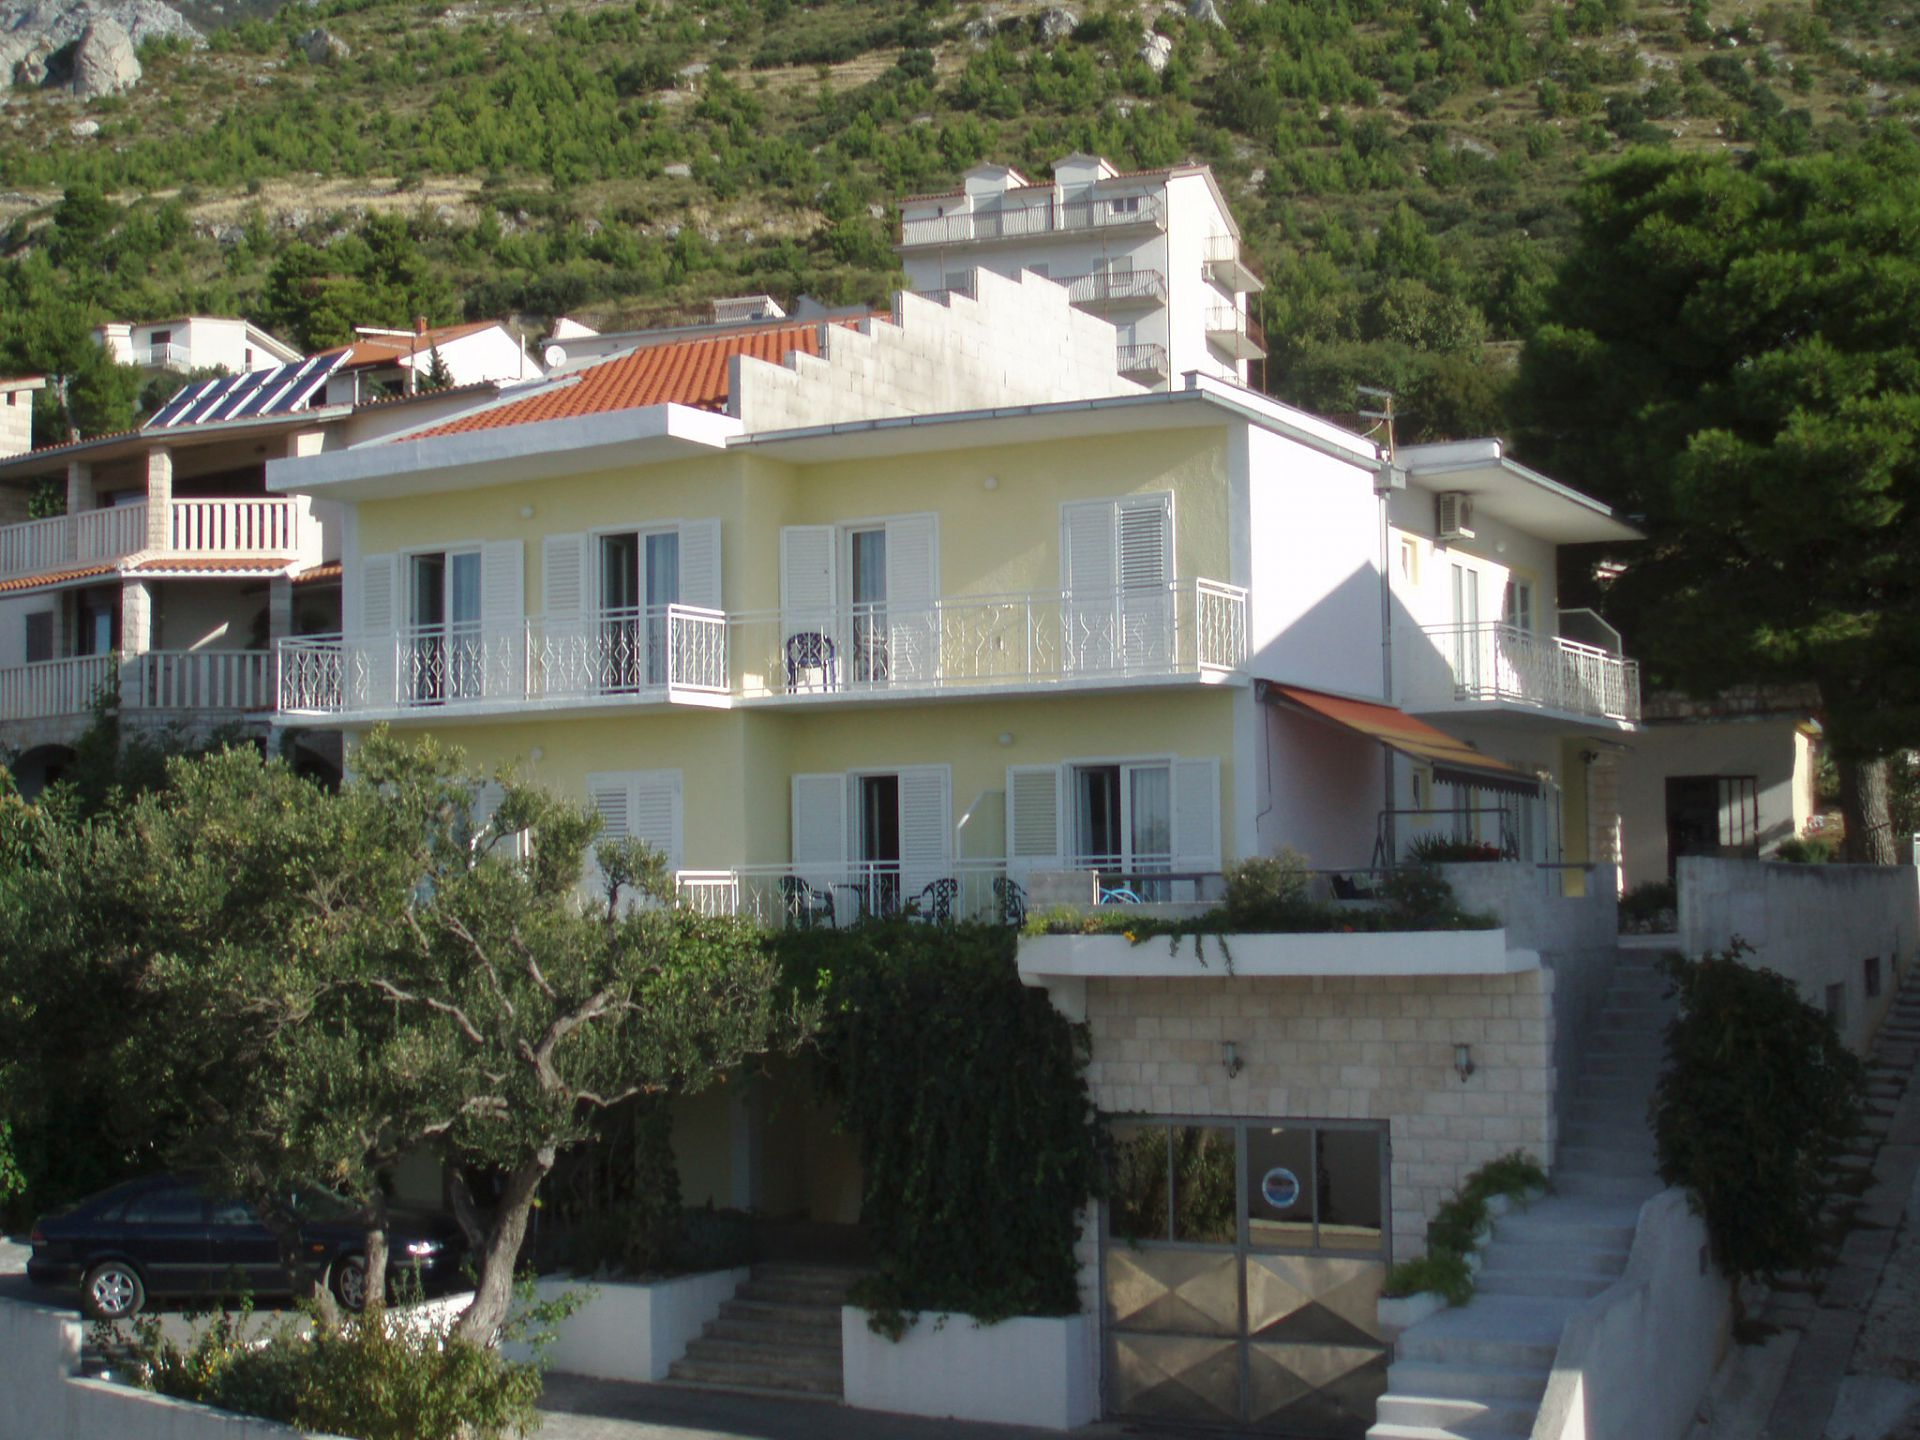 01213BVOD  - Башка Вода - Апартаменты Хорватия